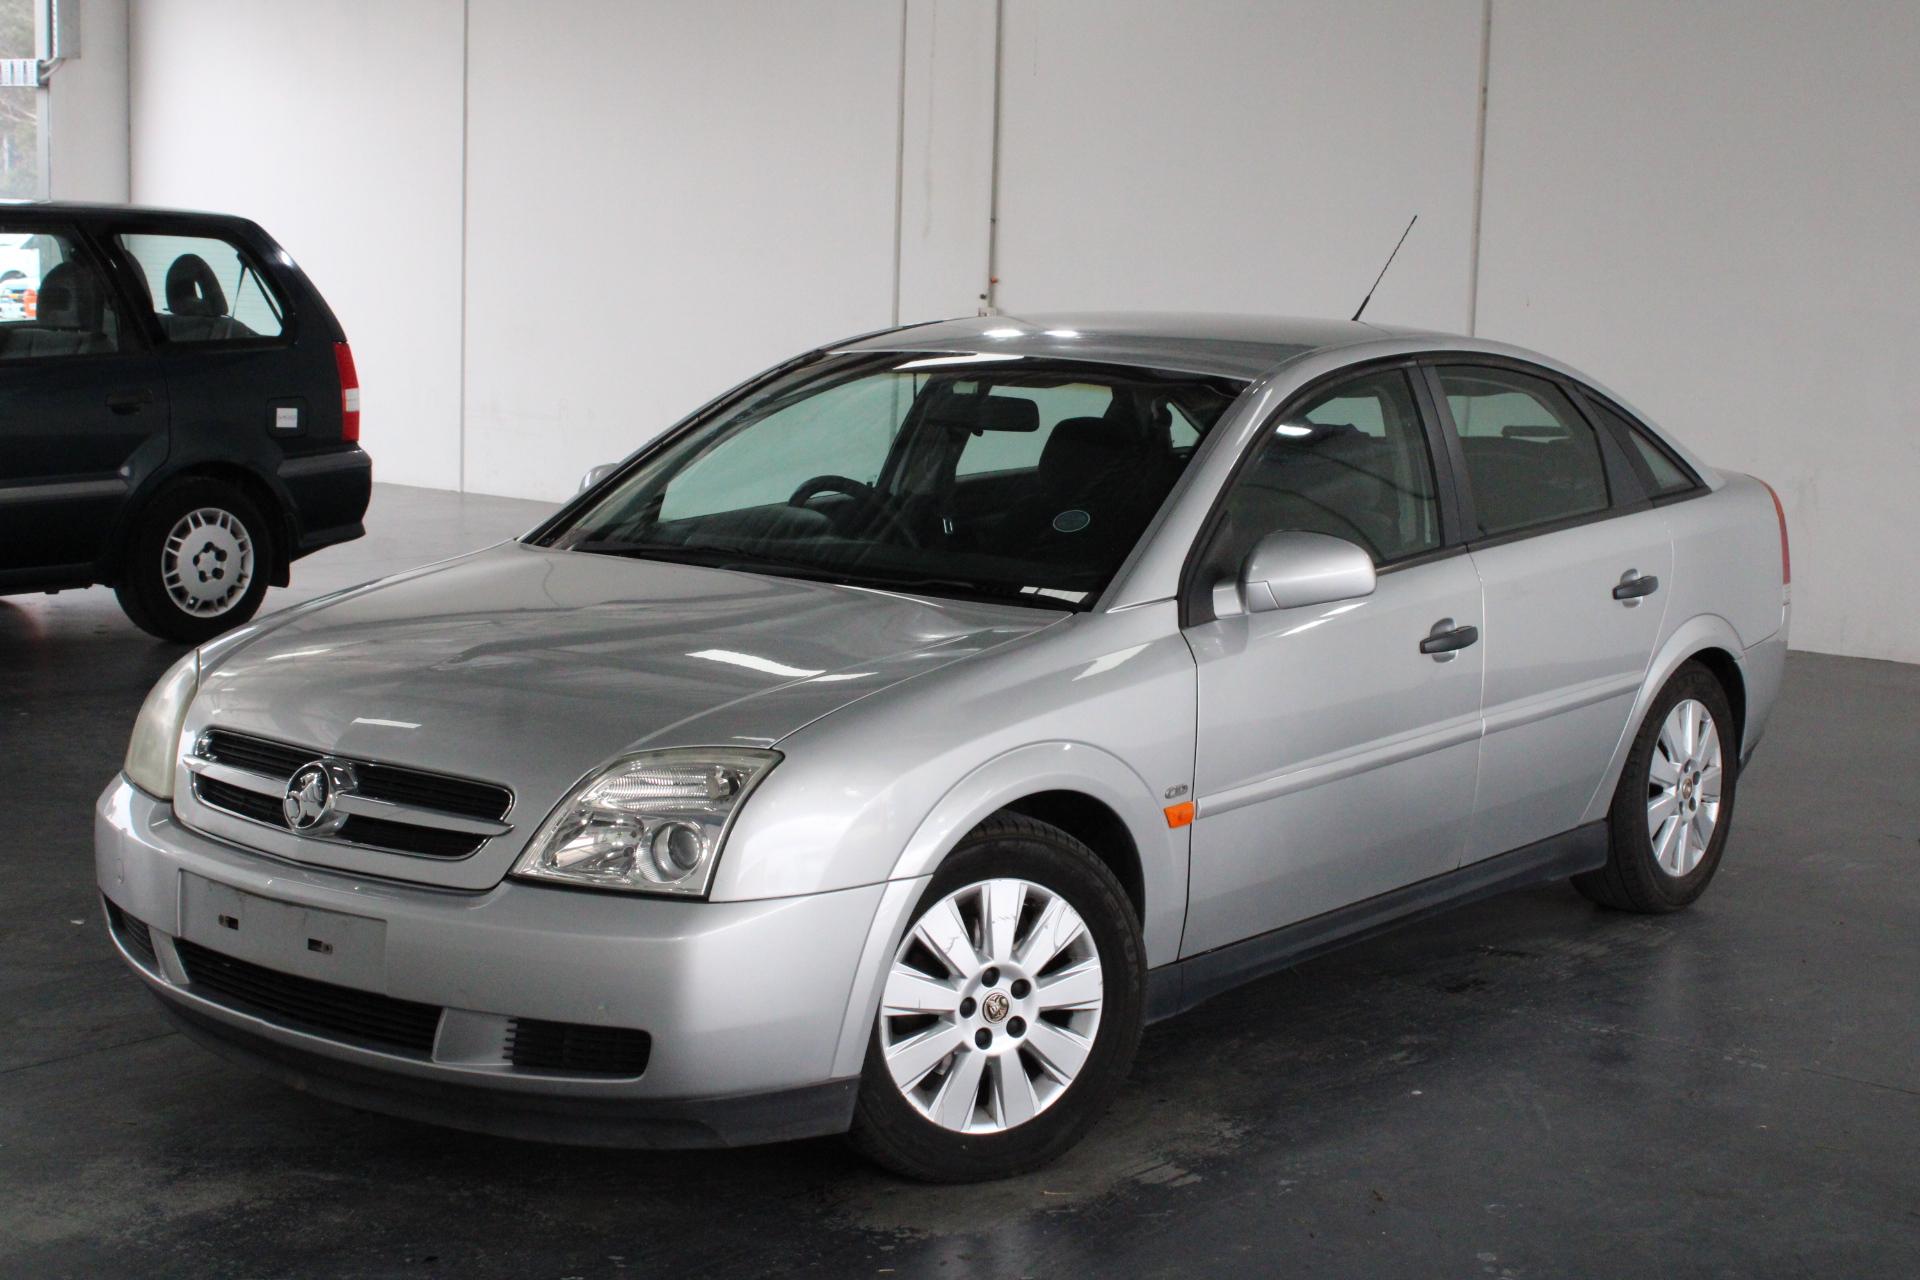 2003 Holden Vectra CD ZC Automatic Hatchback